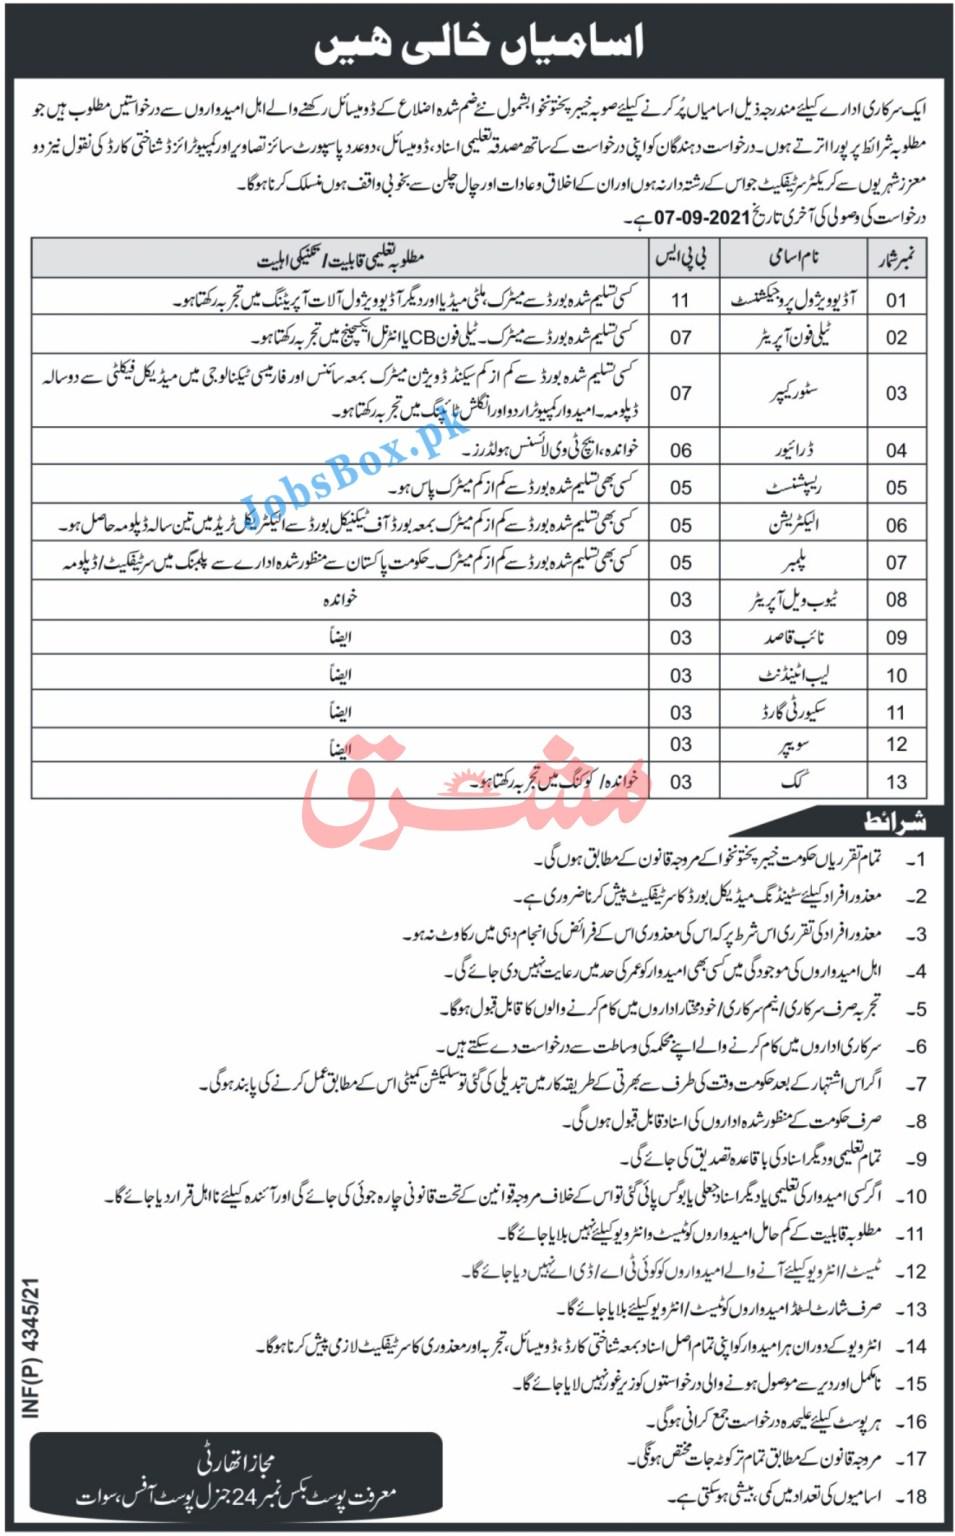 Public Sector Organization Swat Jobs 2021 – Government KPK Jobs